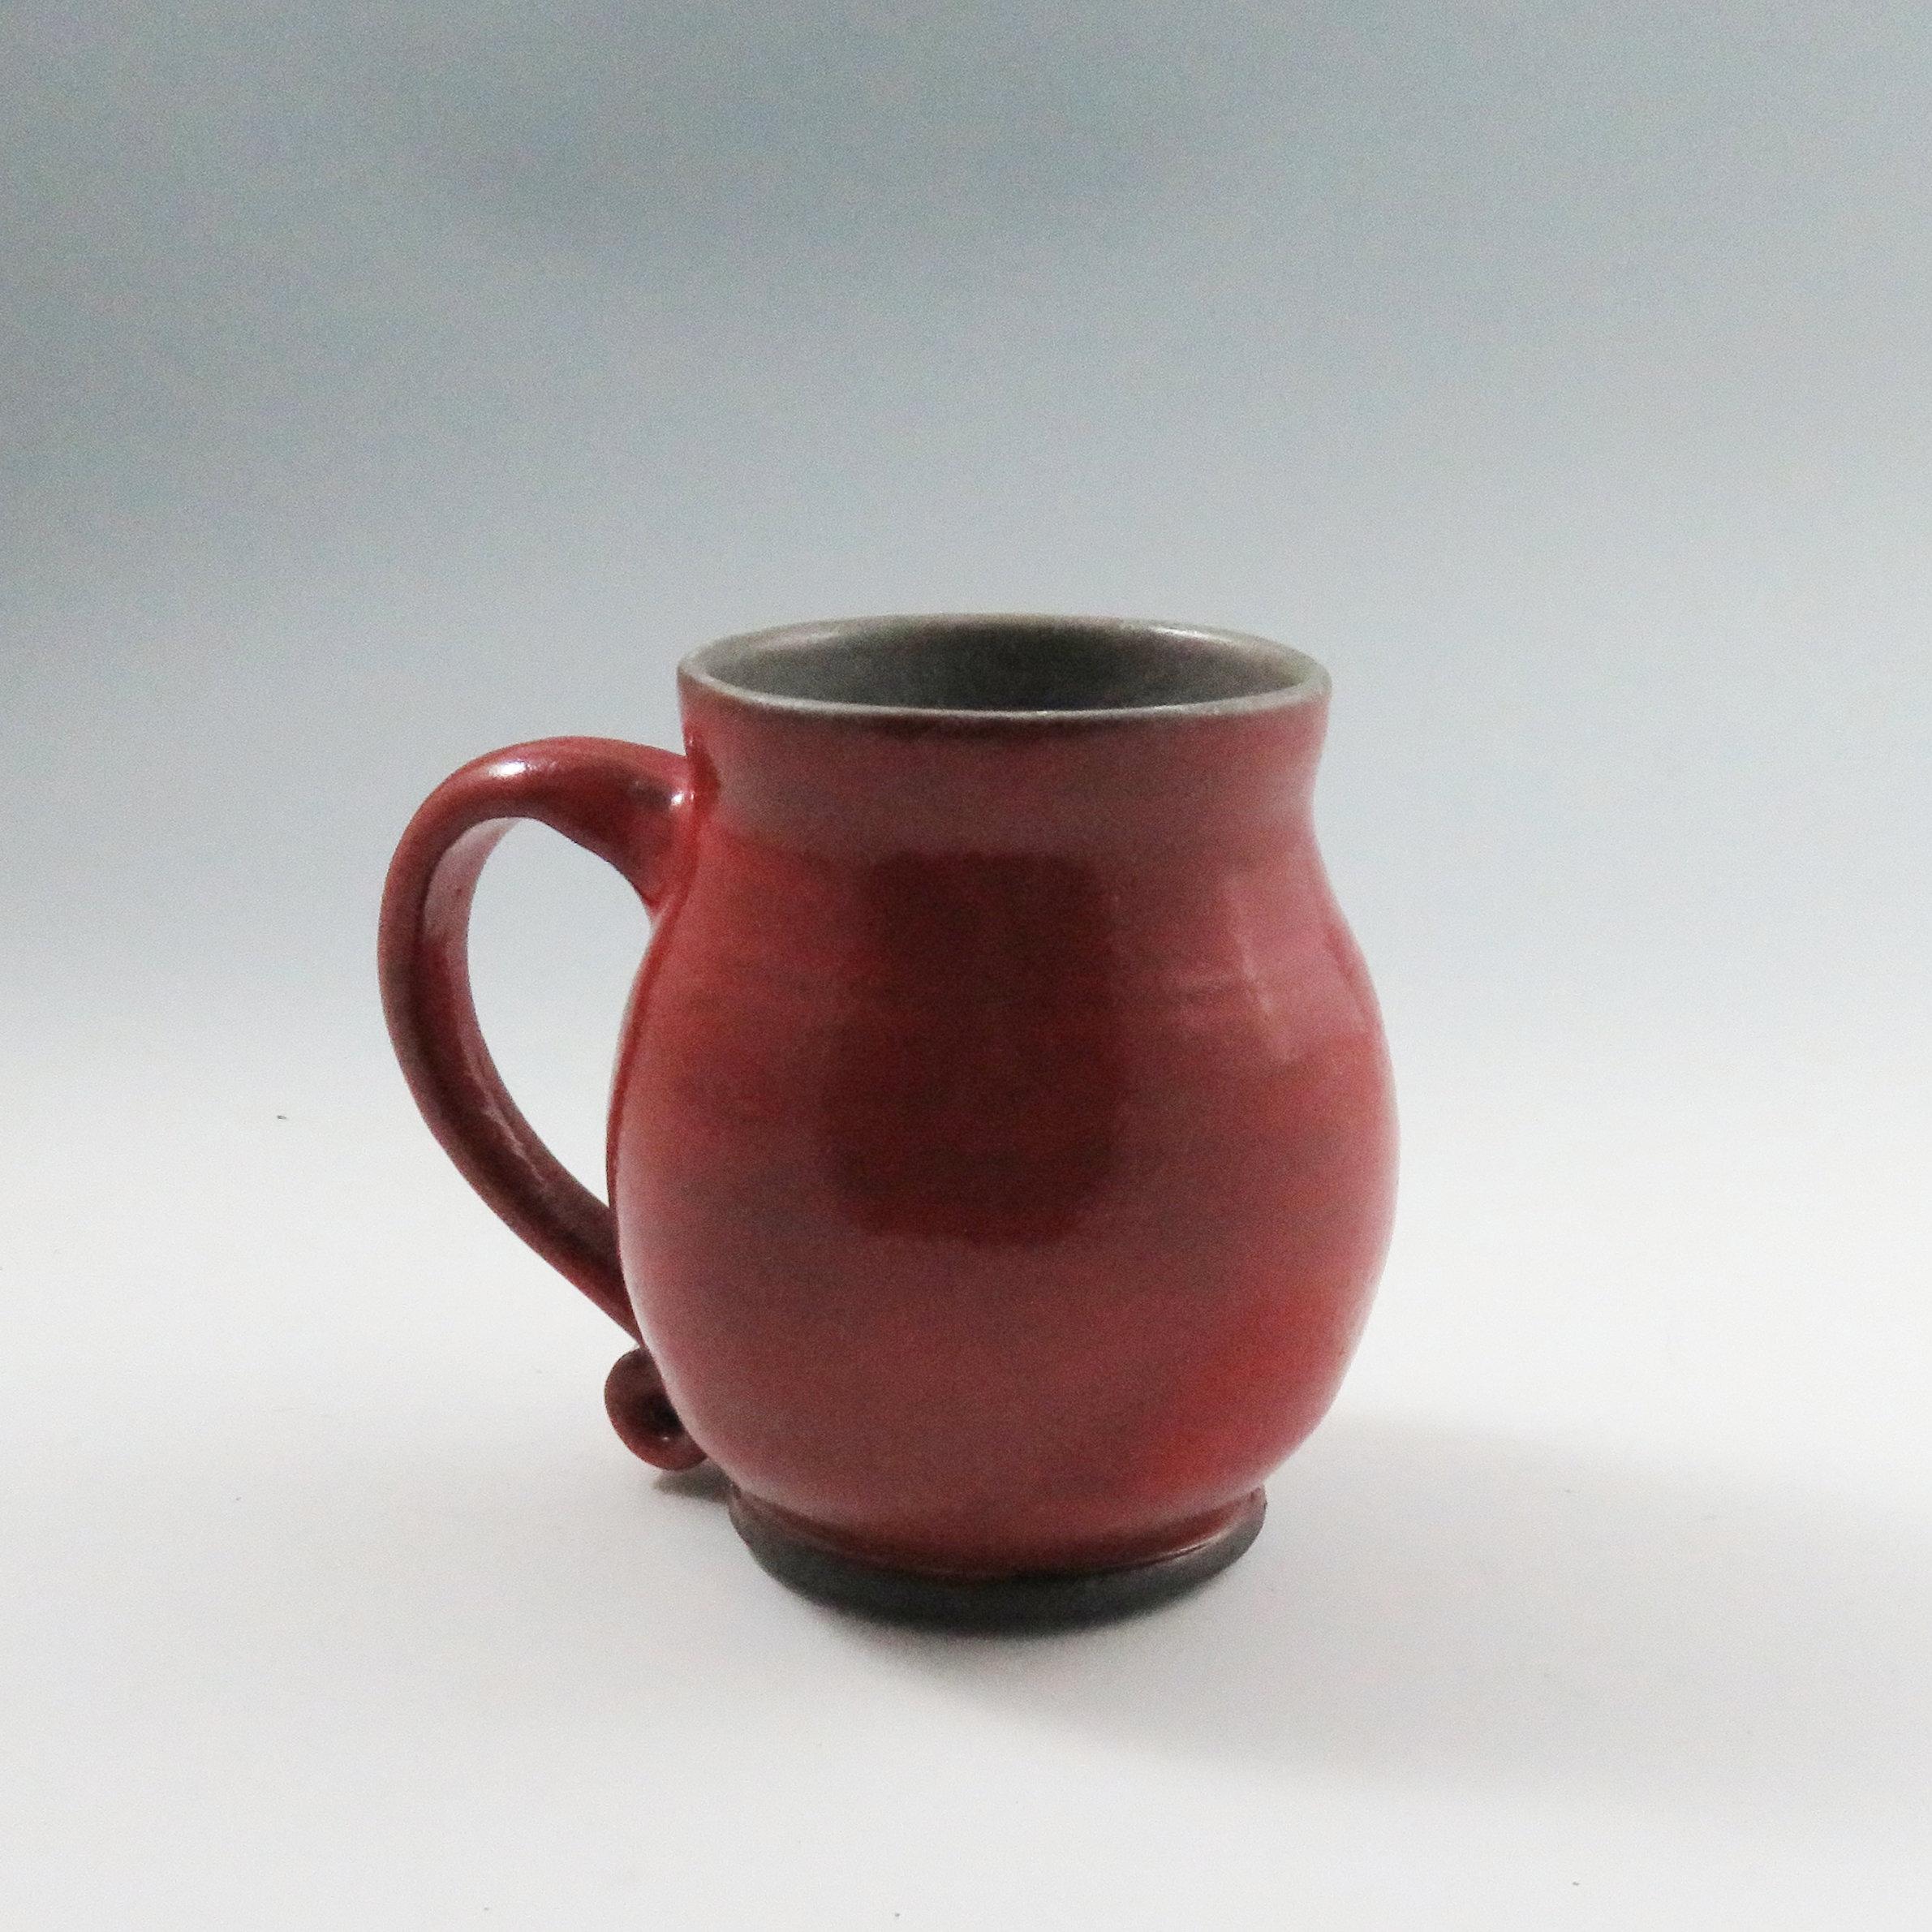 Red Pottery Mug Unique Ceramic Mugs Red Ceramic Mugs Handmade Ready To Ship Red Kitchen Decor Funky Pottery Mugs Soul Shine Pottery Tea Mug